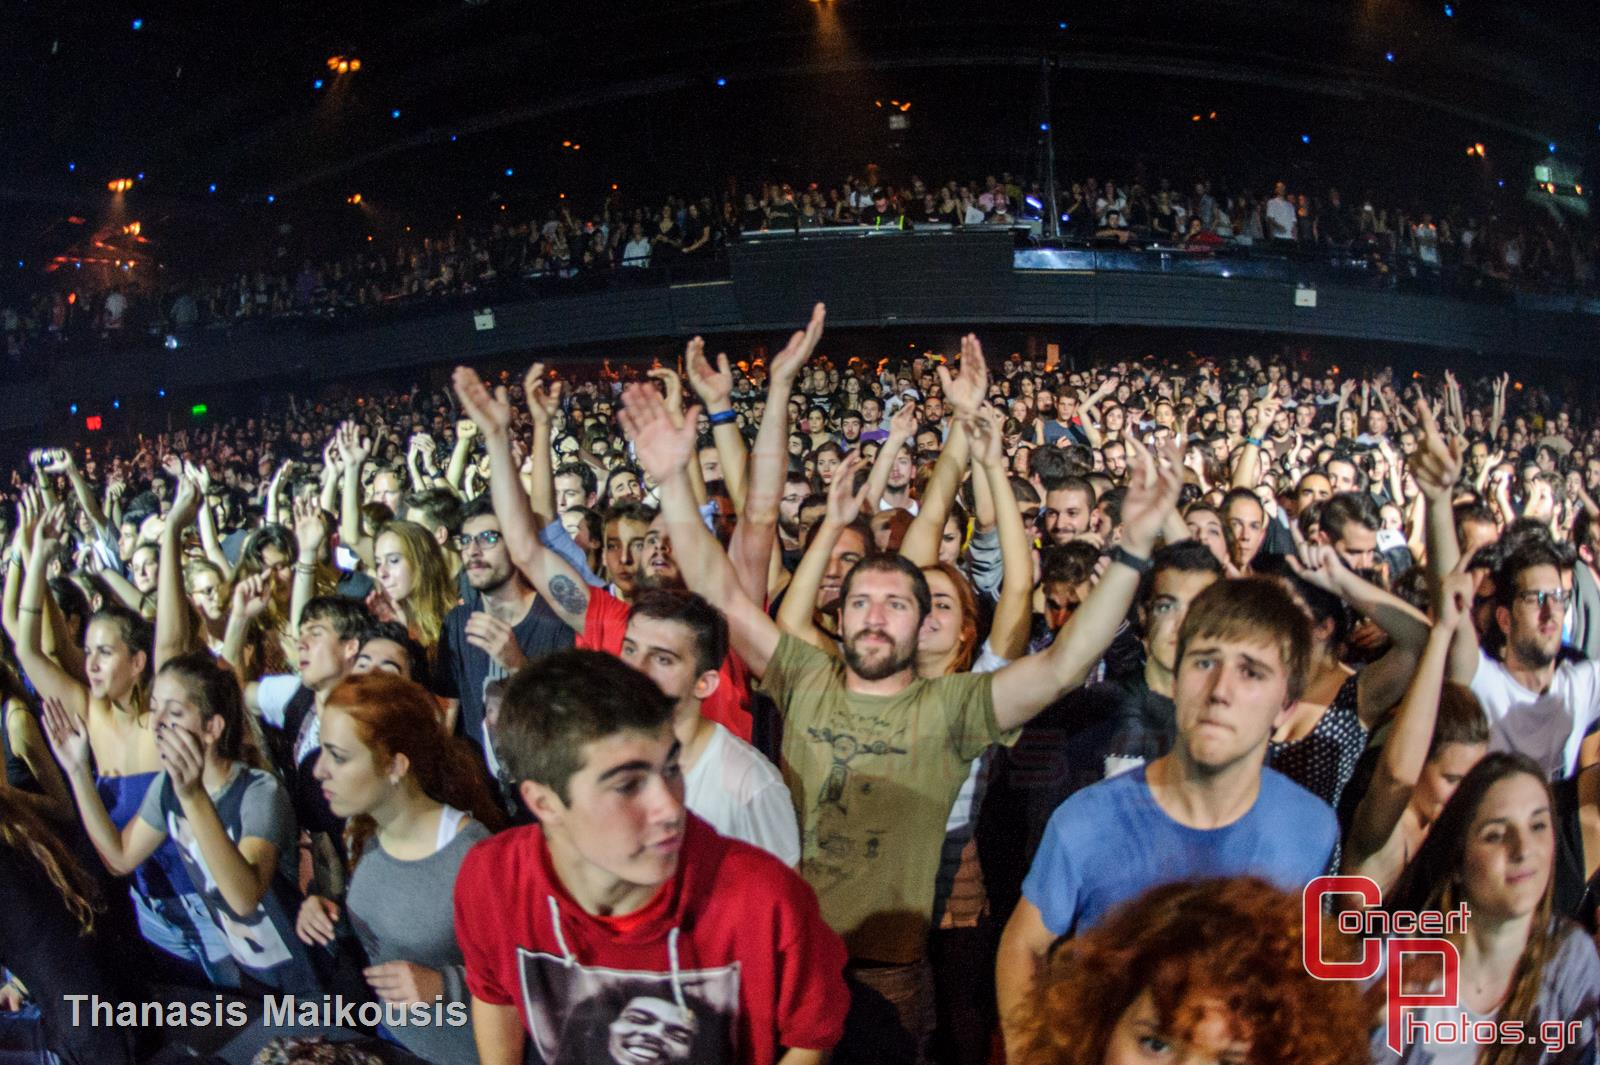 Gramatik-Gramatik Votanikos 2013 photographer: Thanasis Maikousis - ConcertPhotos-5947